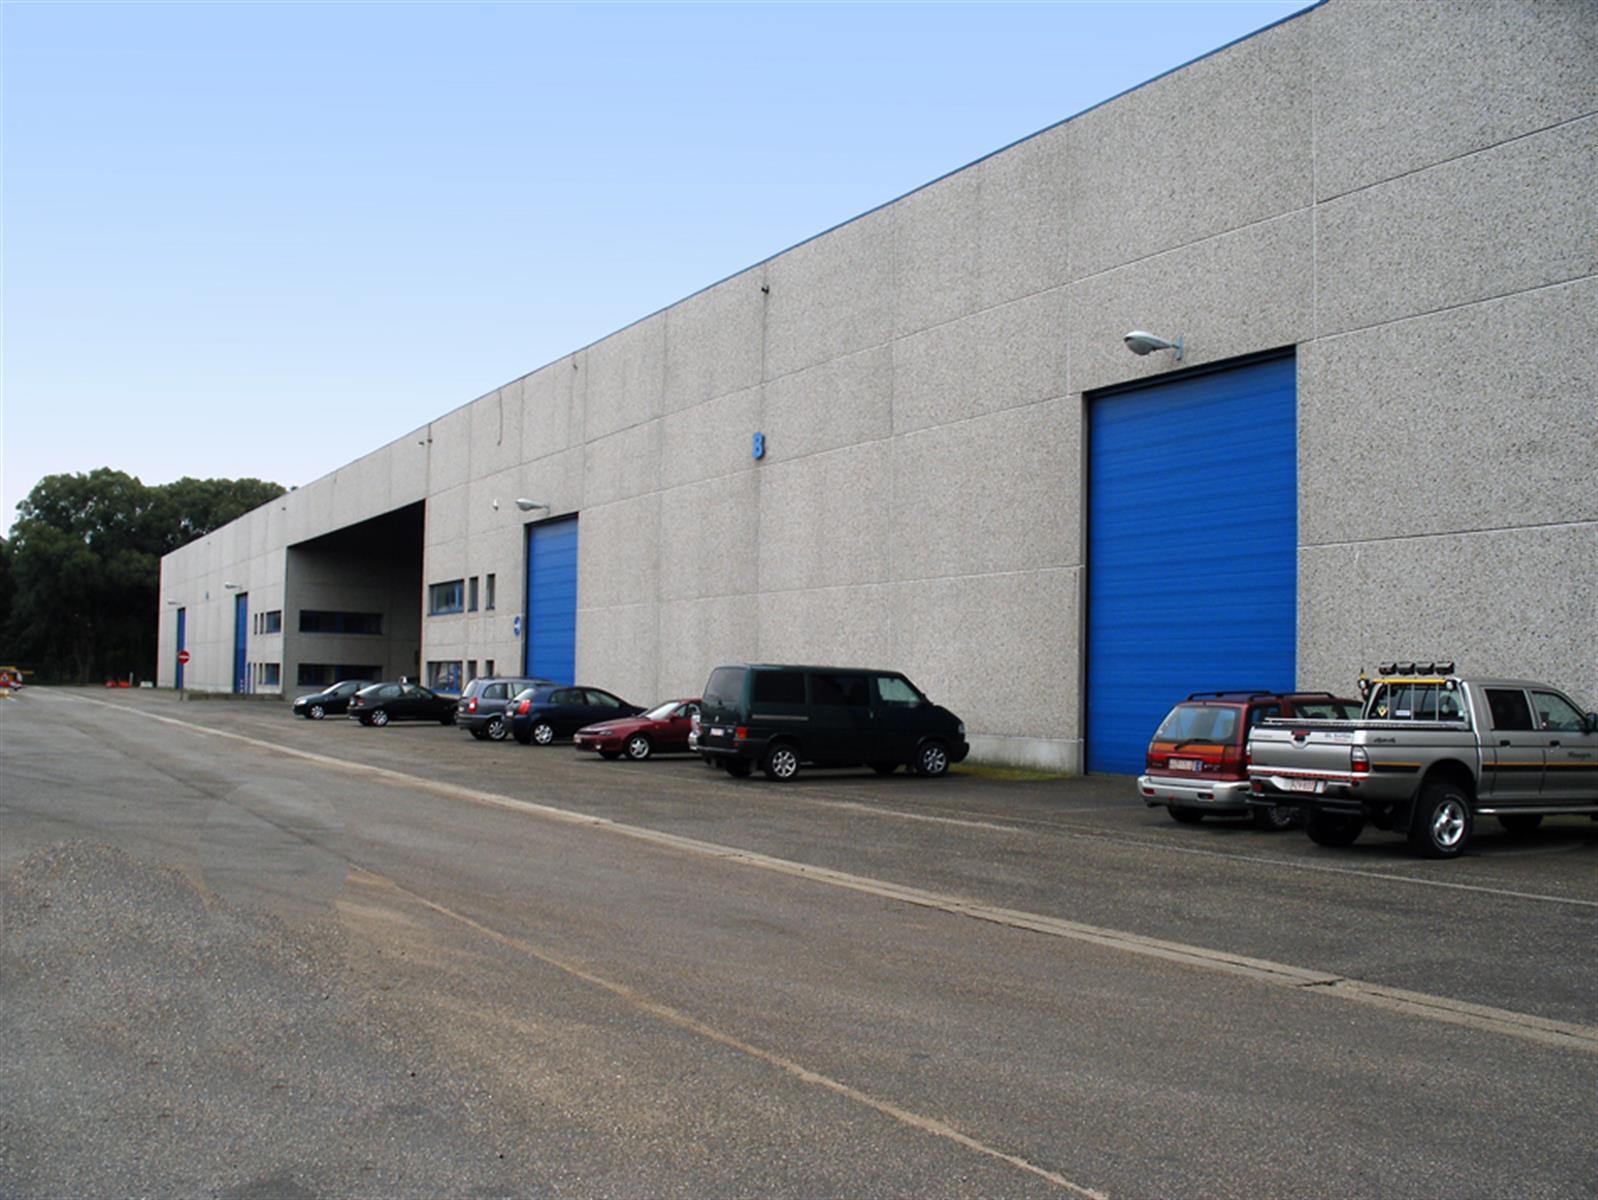 industrieel gebouw te huur KMO UNIT 1620m² MEERDERE LOADING DOCKS te KAPELLEN (B002) 1640m² - 2950 Kapellen, België 5